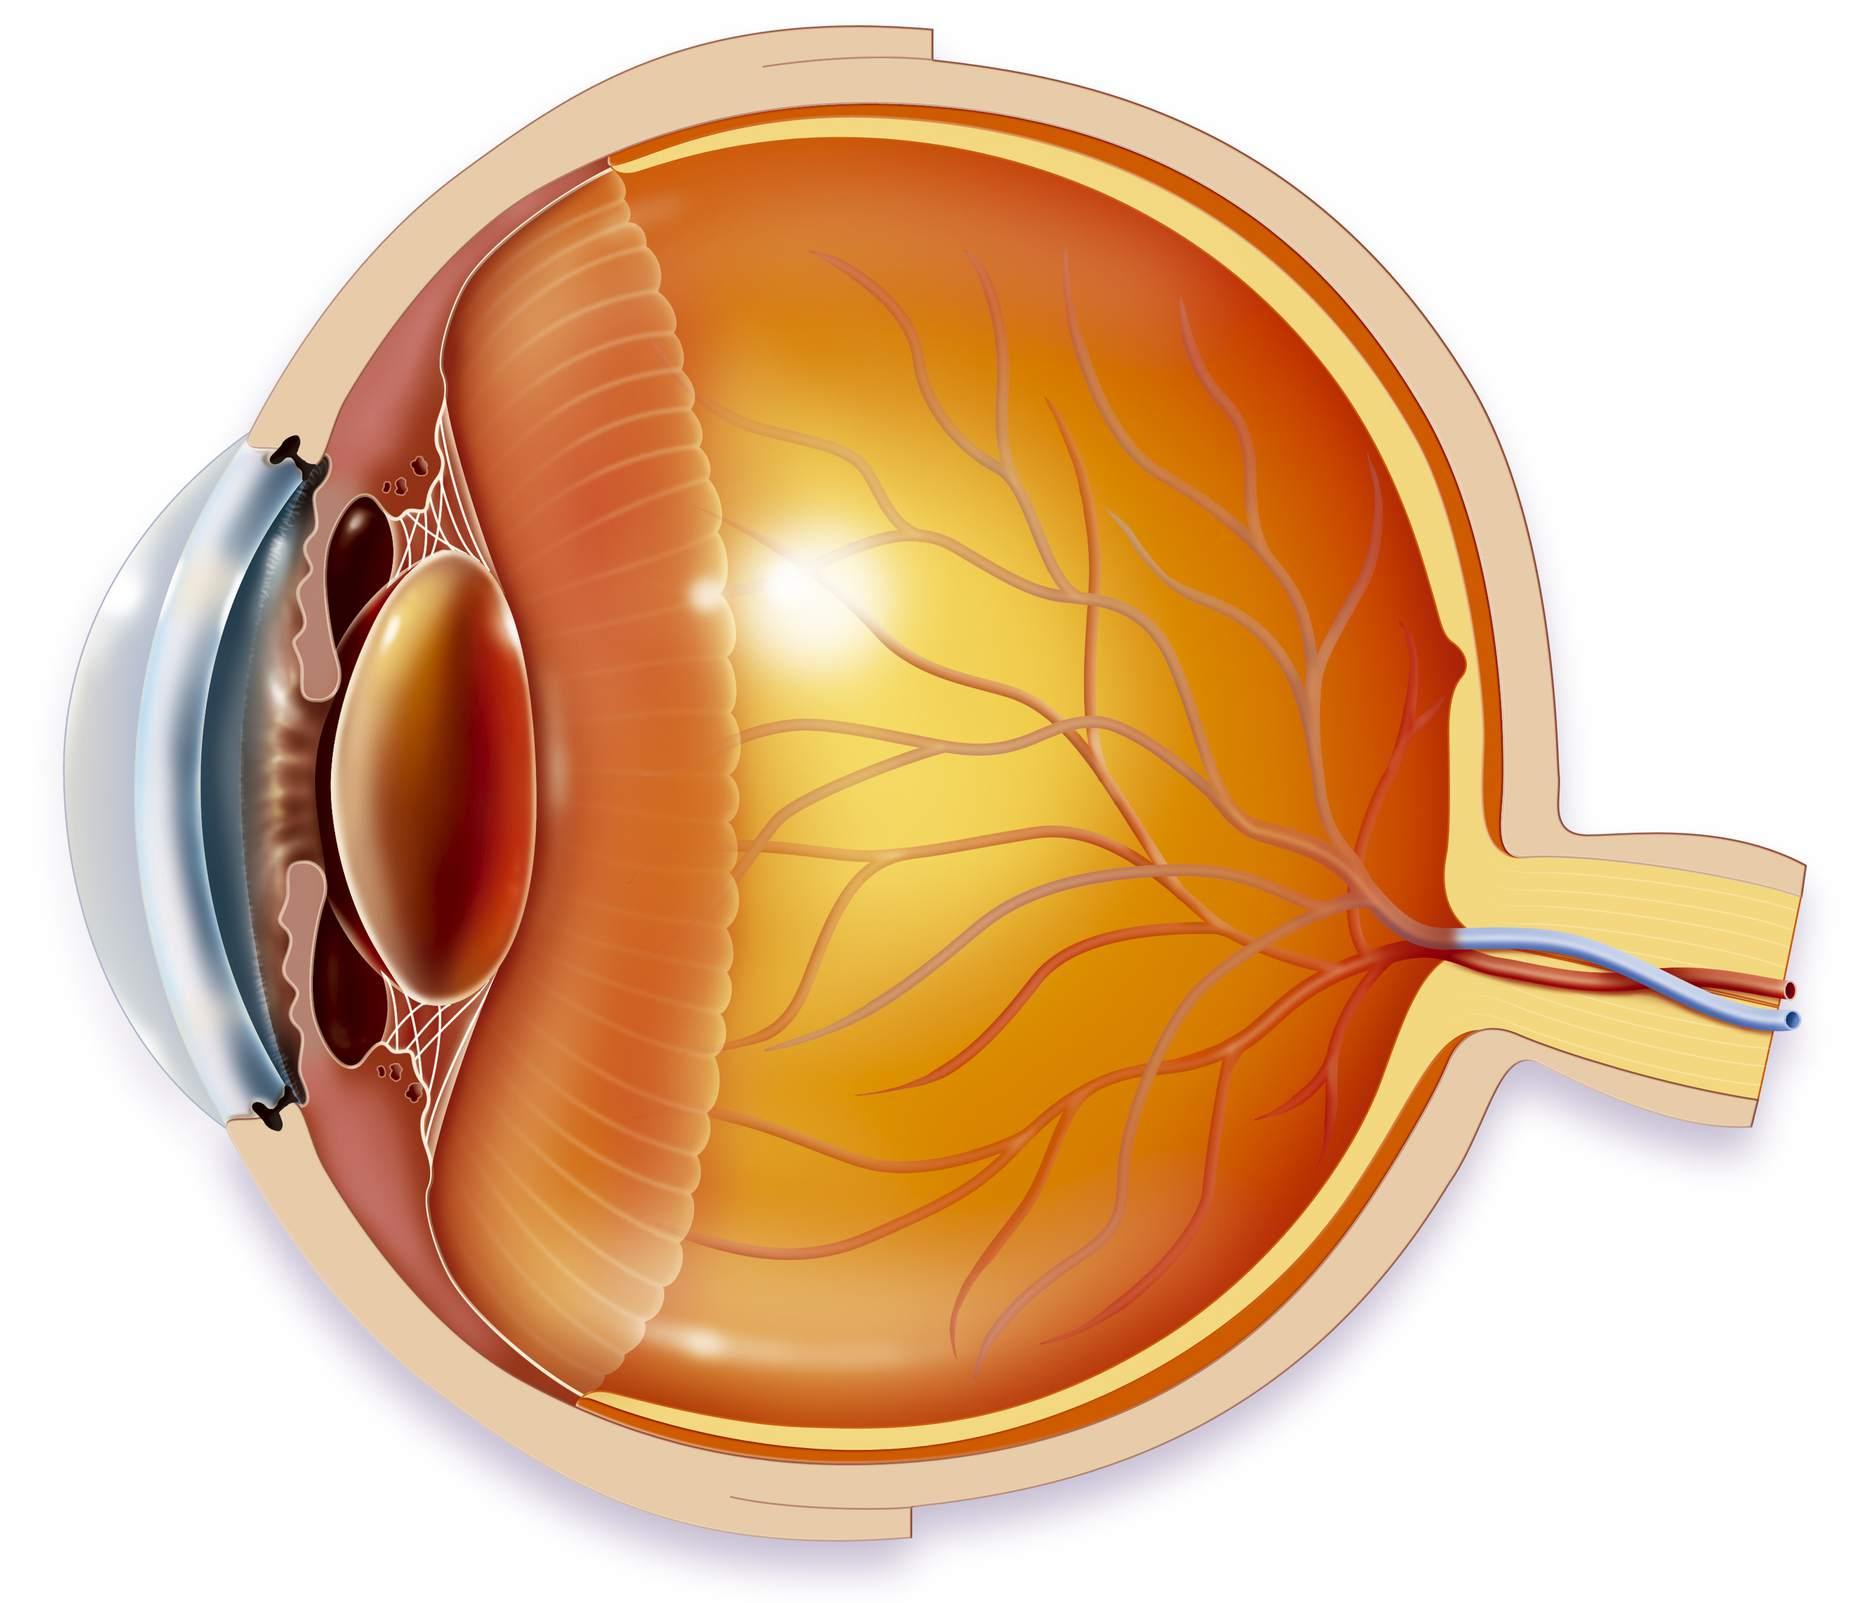 hight resolution of anatomy of an eye illustration